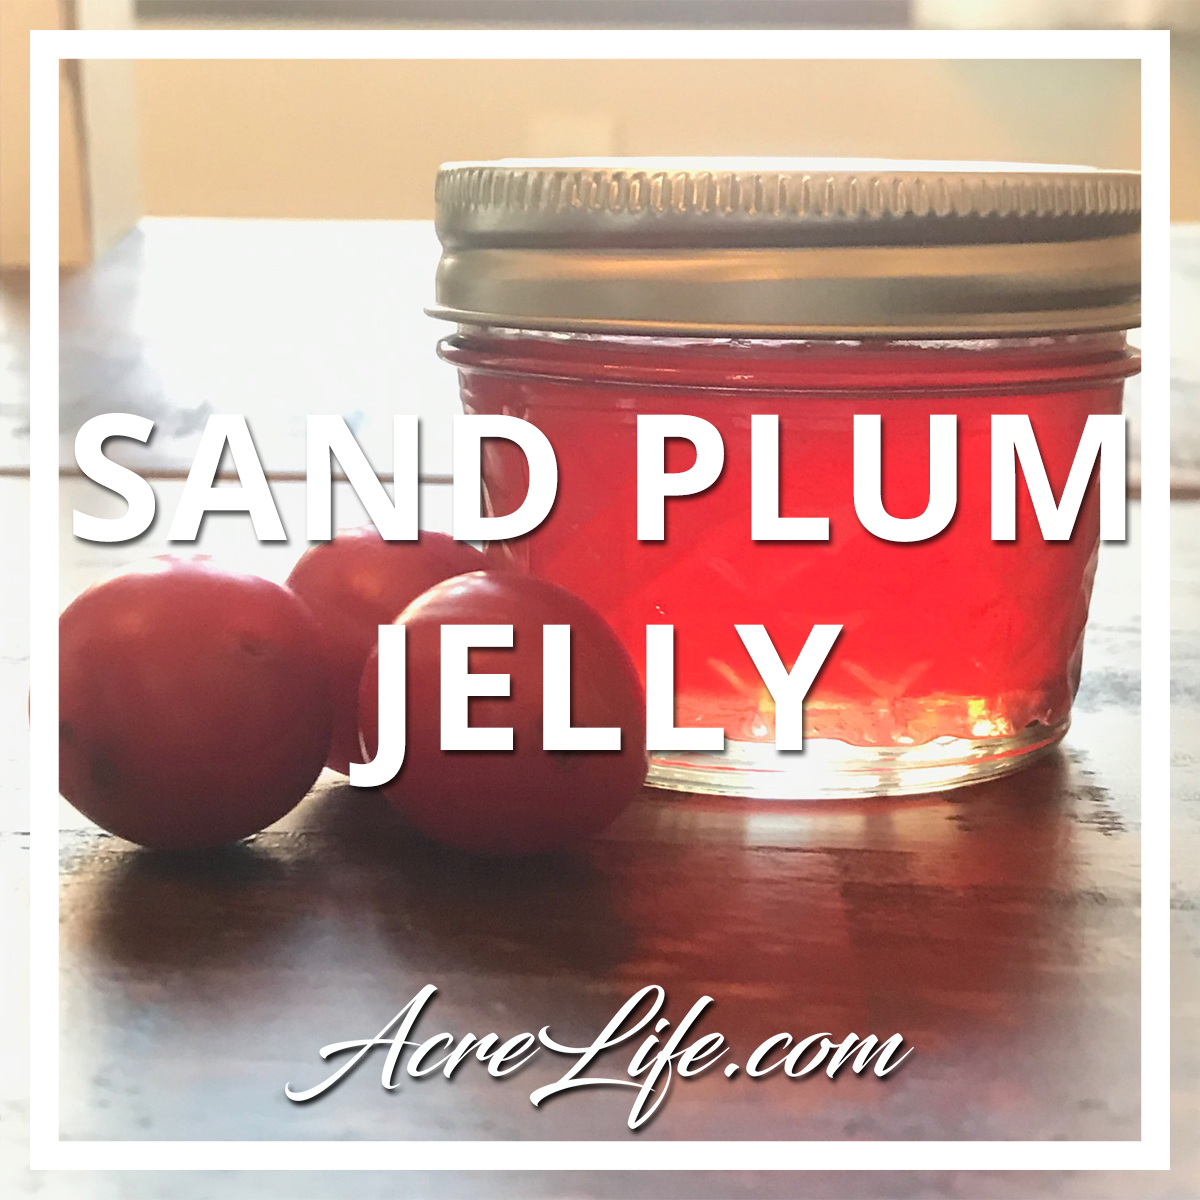 Sand Plum Jelly - Acre Life